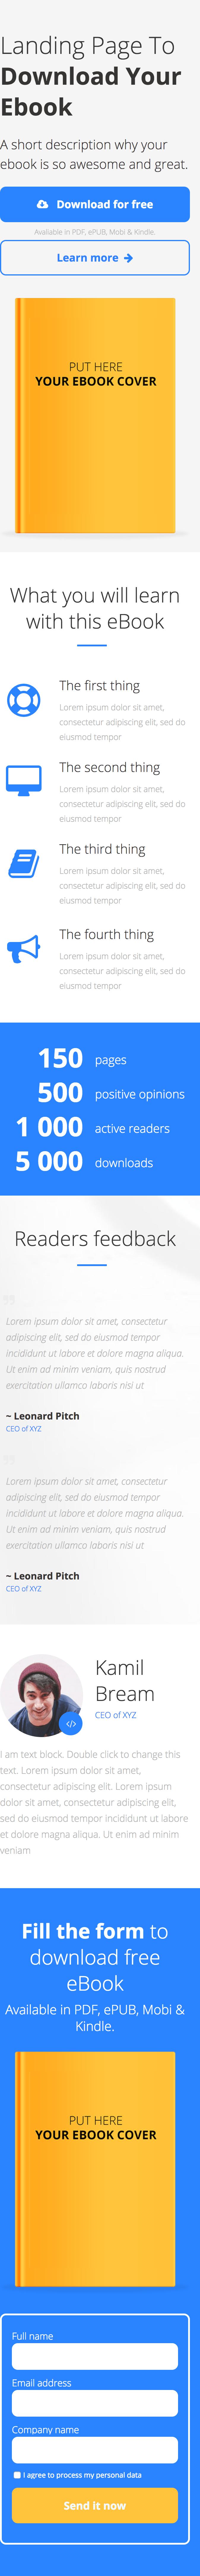 Dystrybucja e-booka